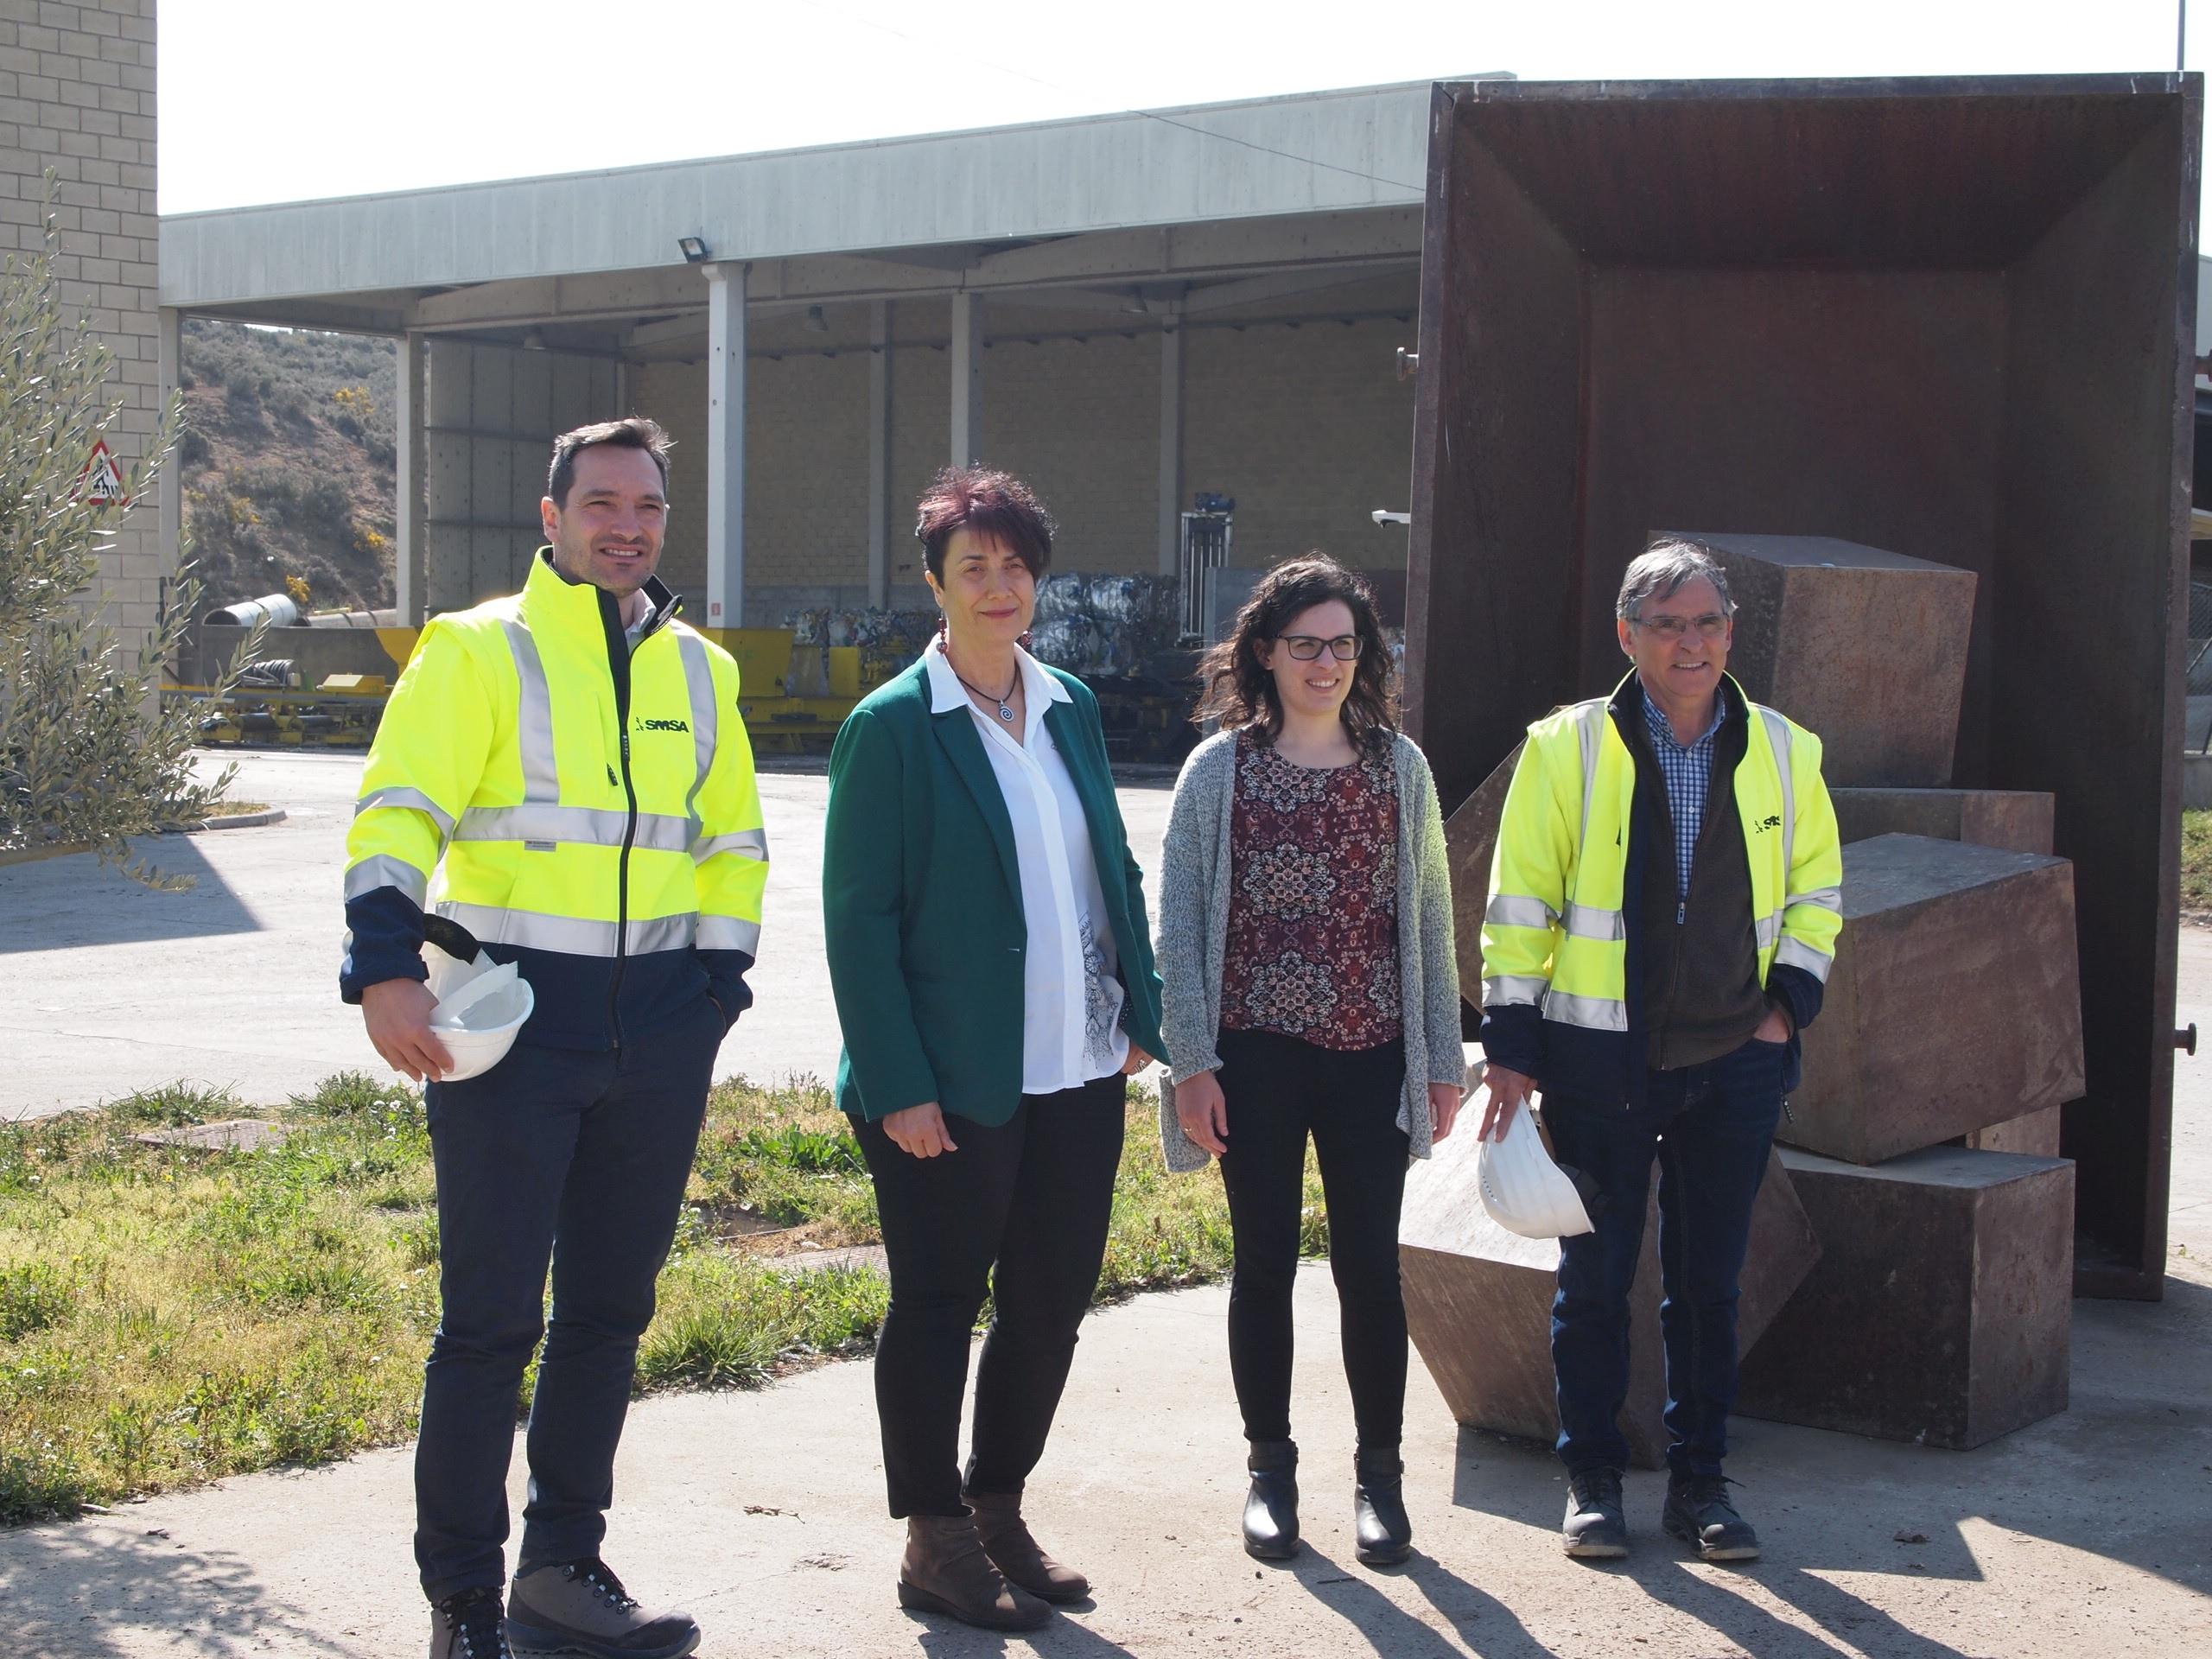 Datos de recogida de residuos en 2018